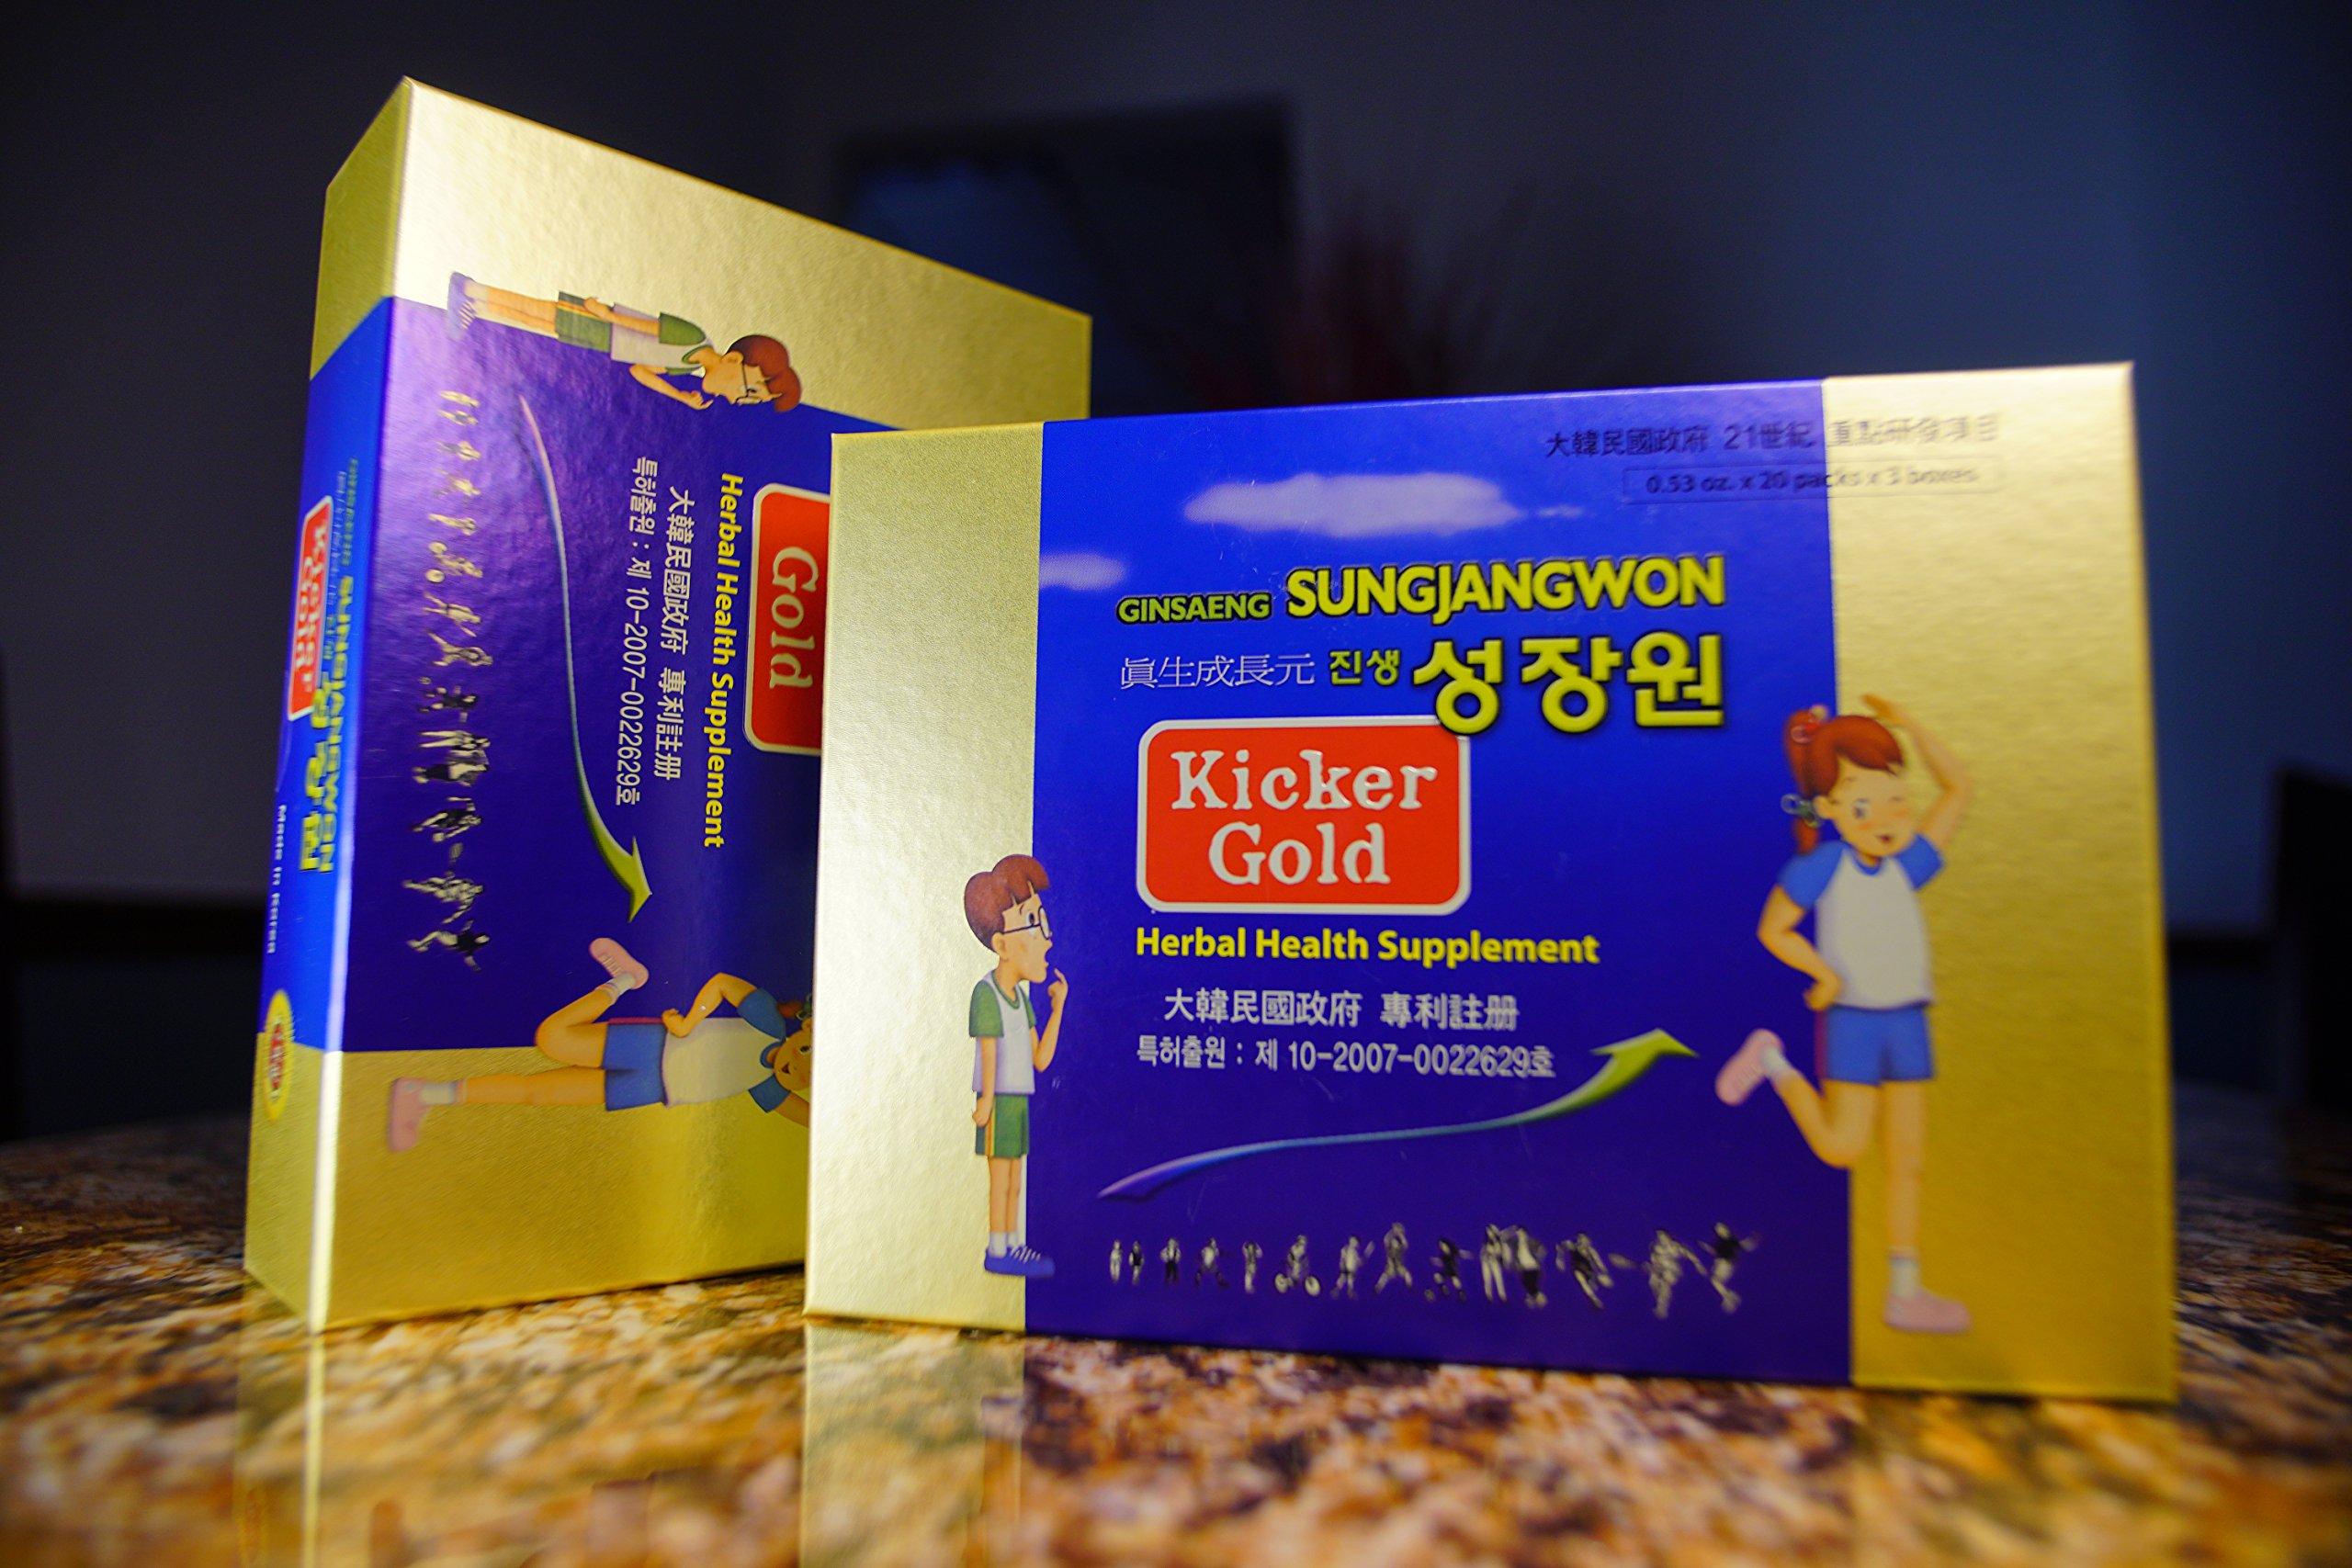 Ginsaeng Sungjangwon Kicker Gold by Kicker Gold (Image #1)